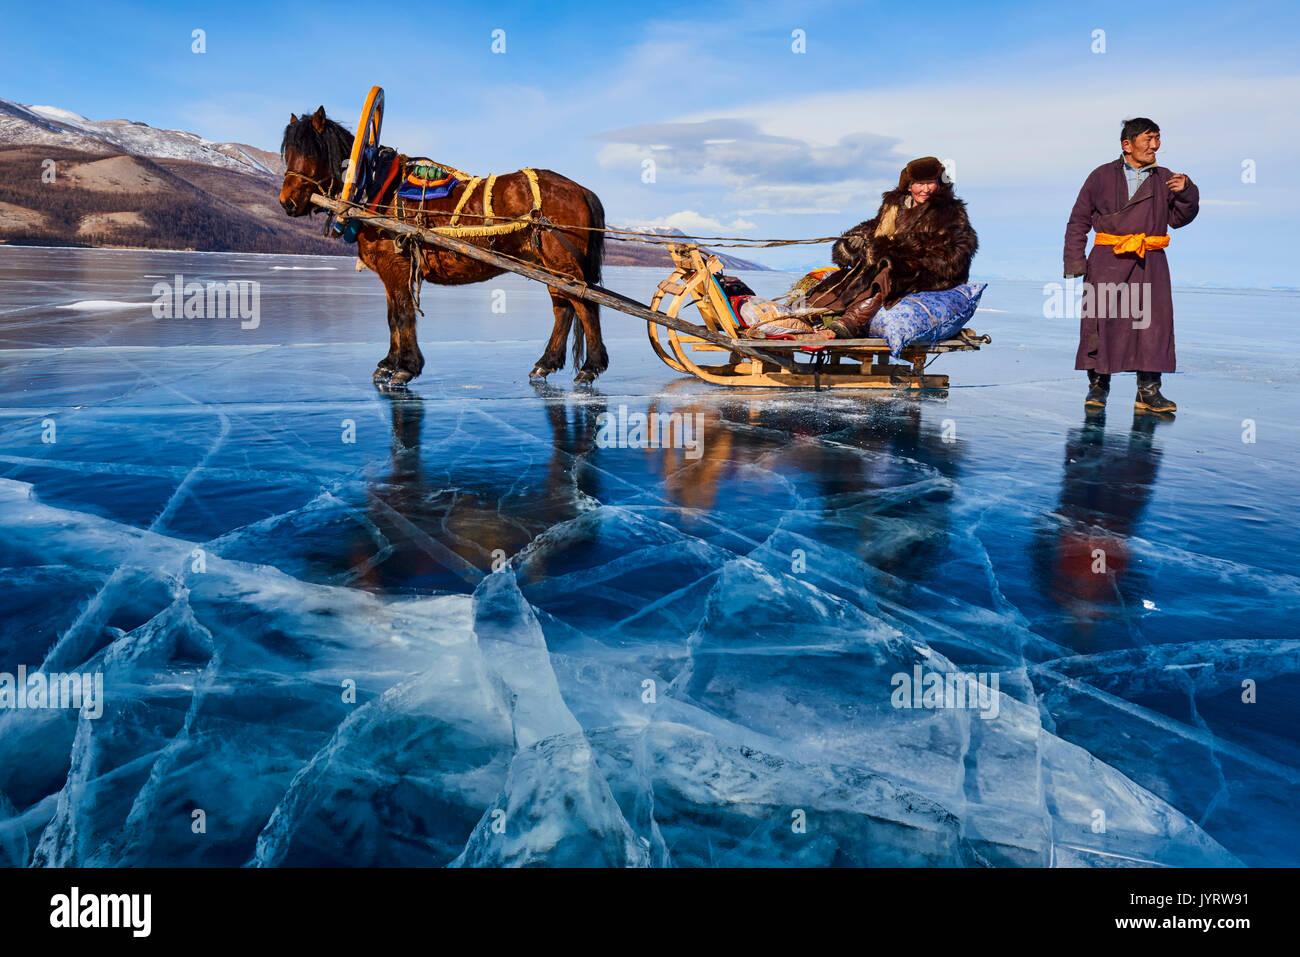 Mongolia, Khovsgol provincia, slitta trainata da cavalli sul lago ghiacciato di Khovsgol in inverno Immagini Stock